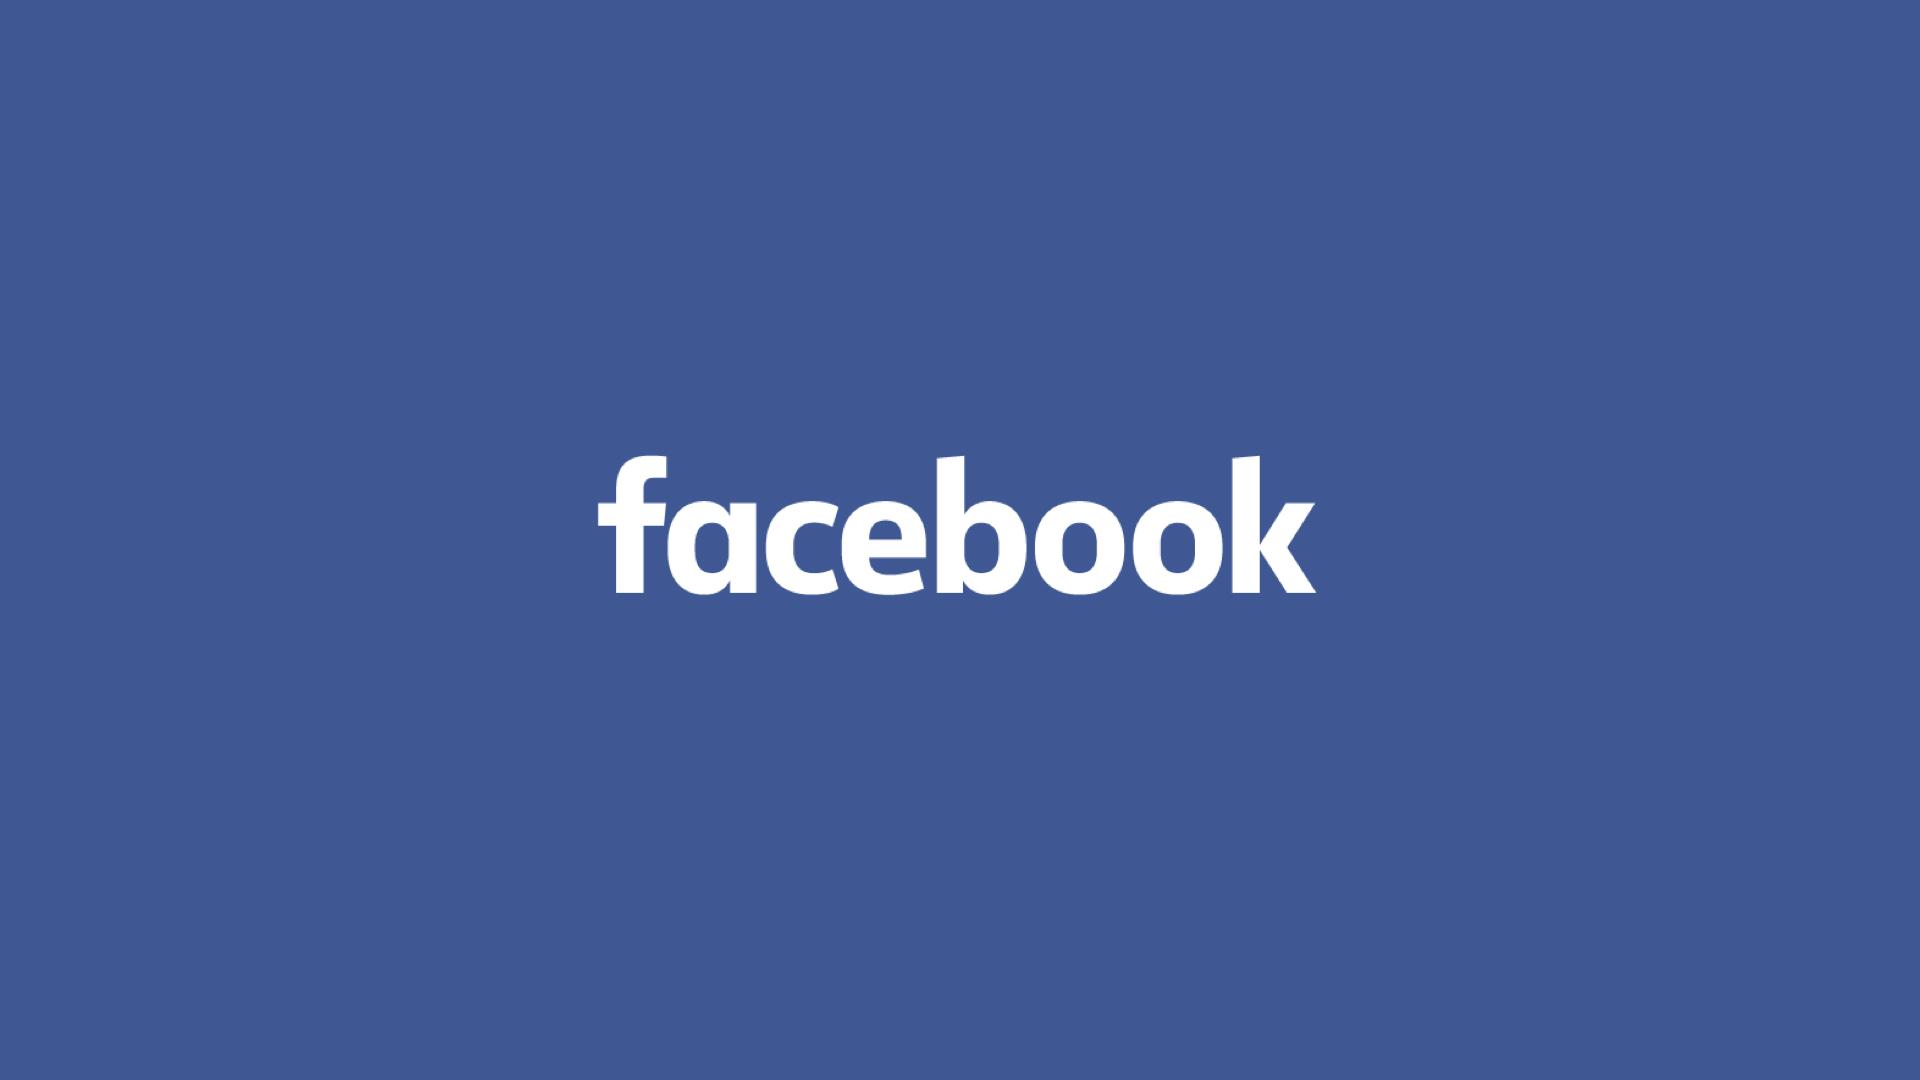 facebookblocksaustralianusersfromsharingorviewingnewscontent